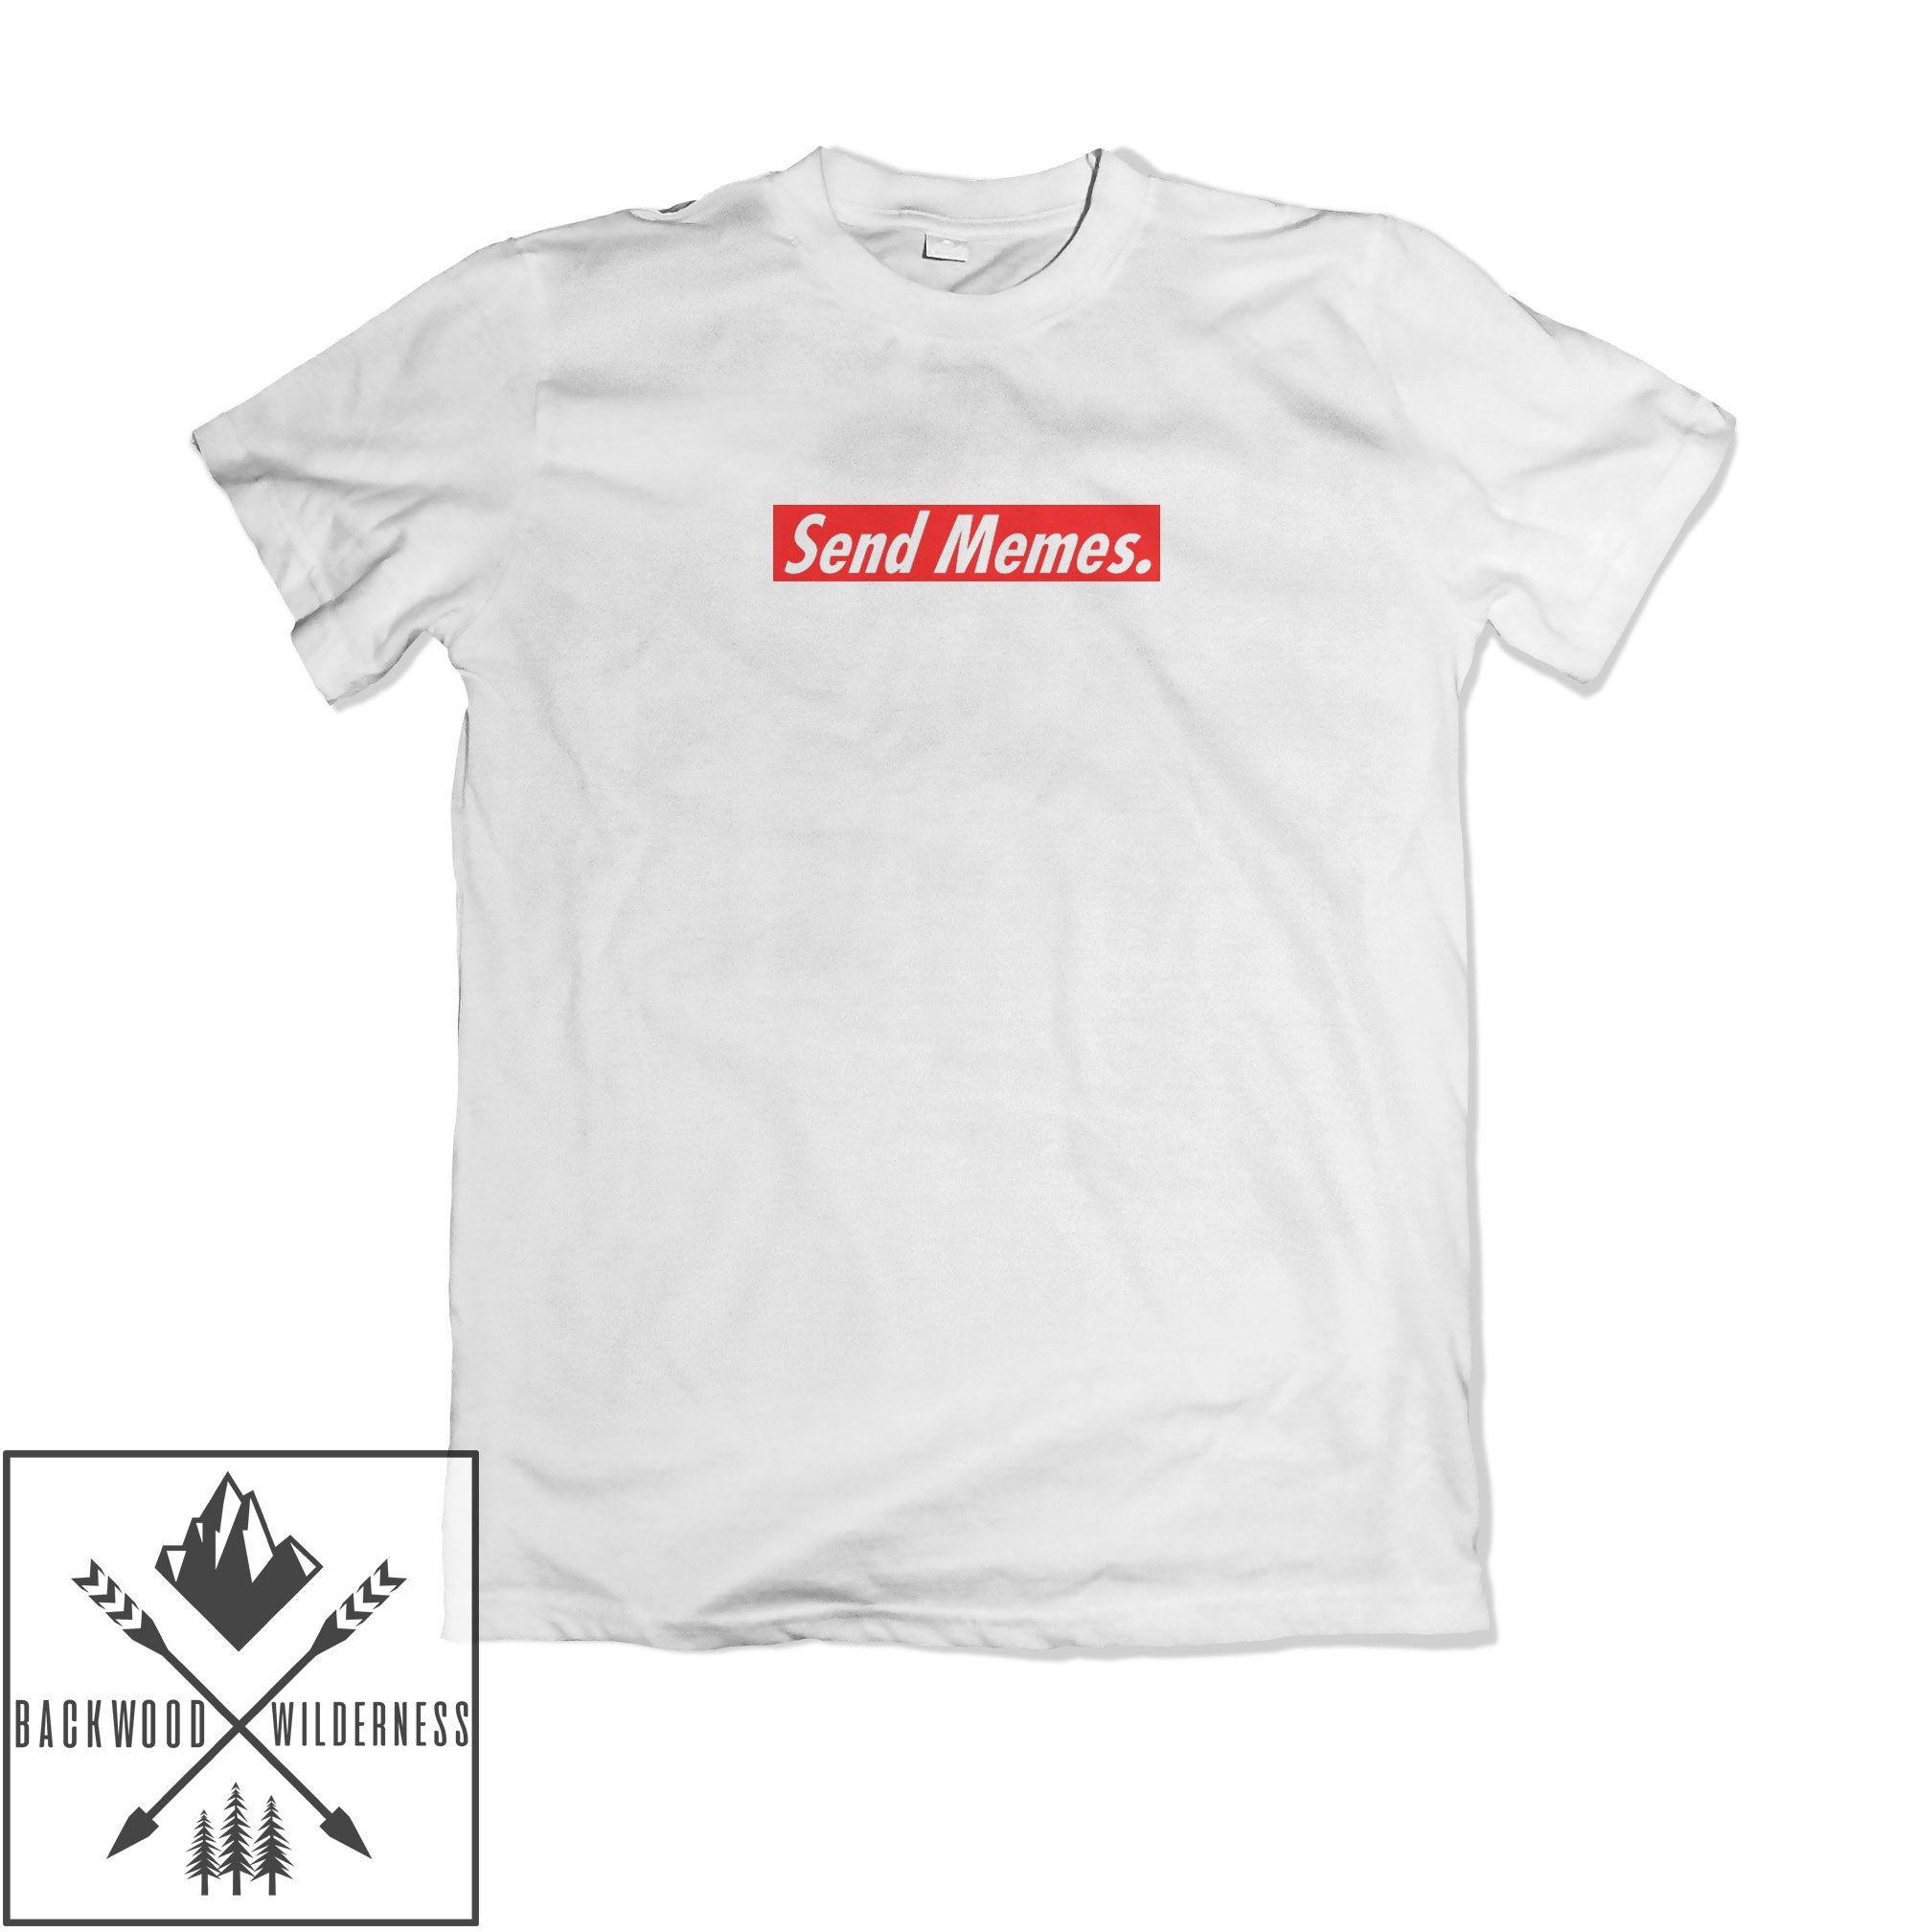 324c6b75e802b Send Menes Box logo Funny Hipster Streetwear Hypebeast Slogan Tumblr Unisex  Mens Womans T Shirt by BackwoodWilderness on Etsy